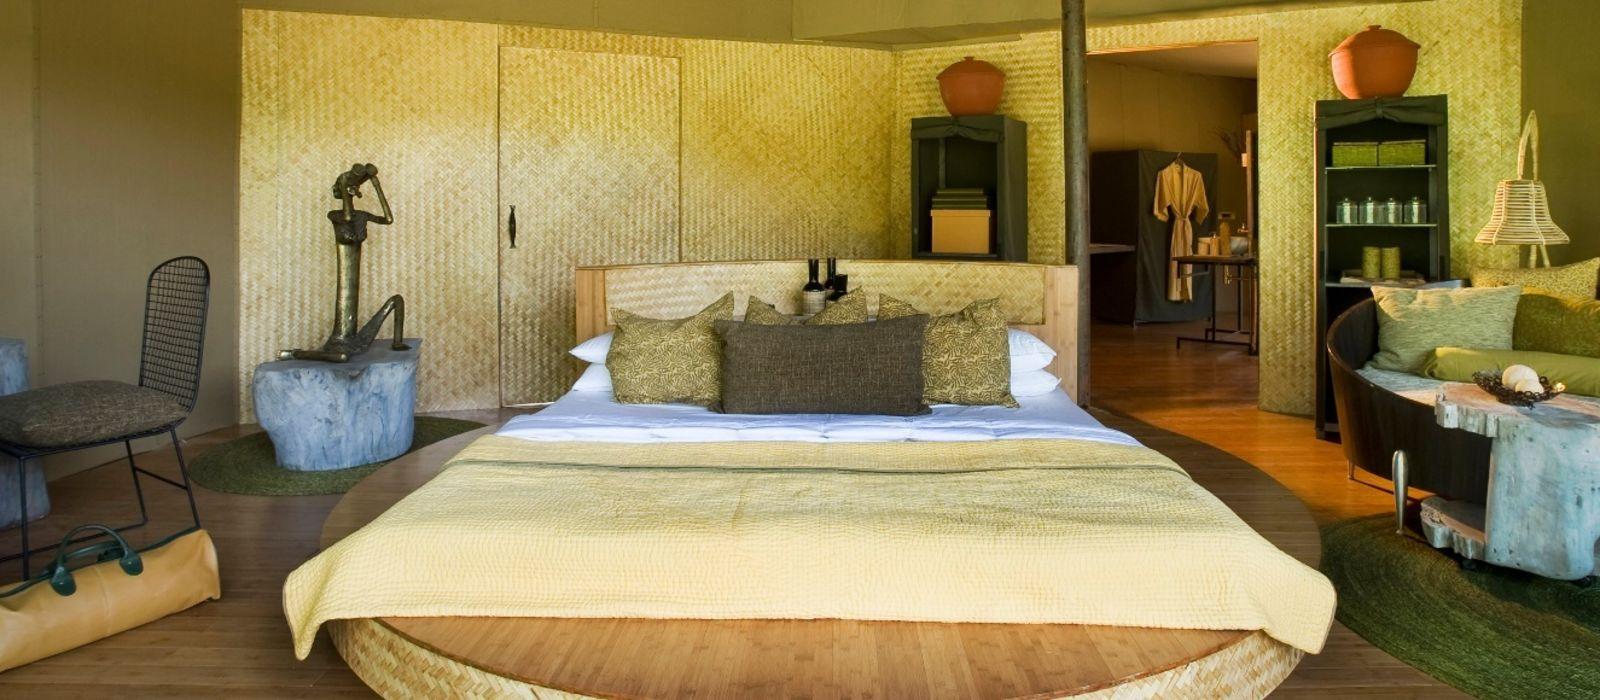 Hotel Banjaar Tola Central & West India